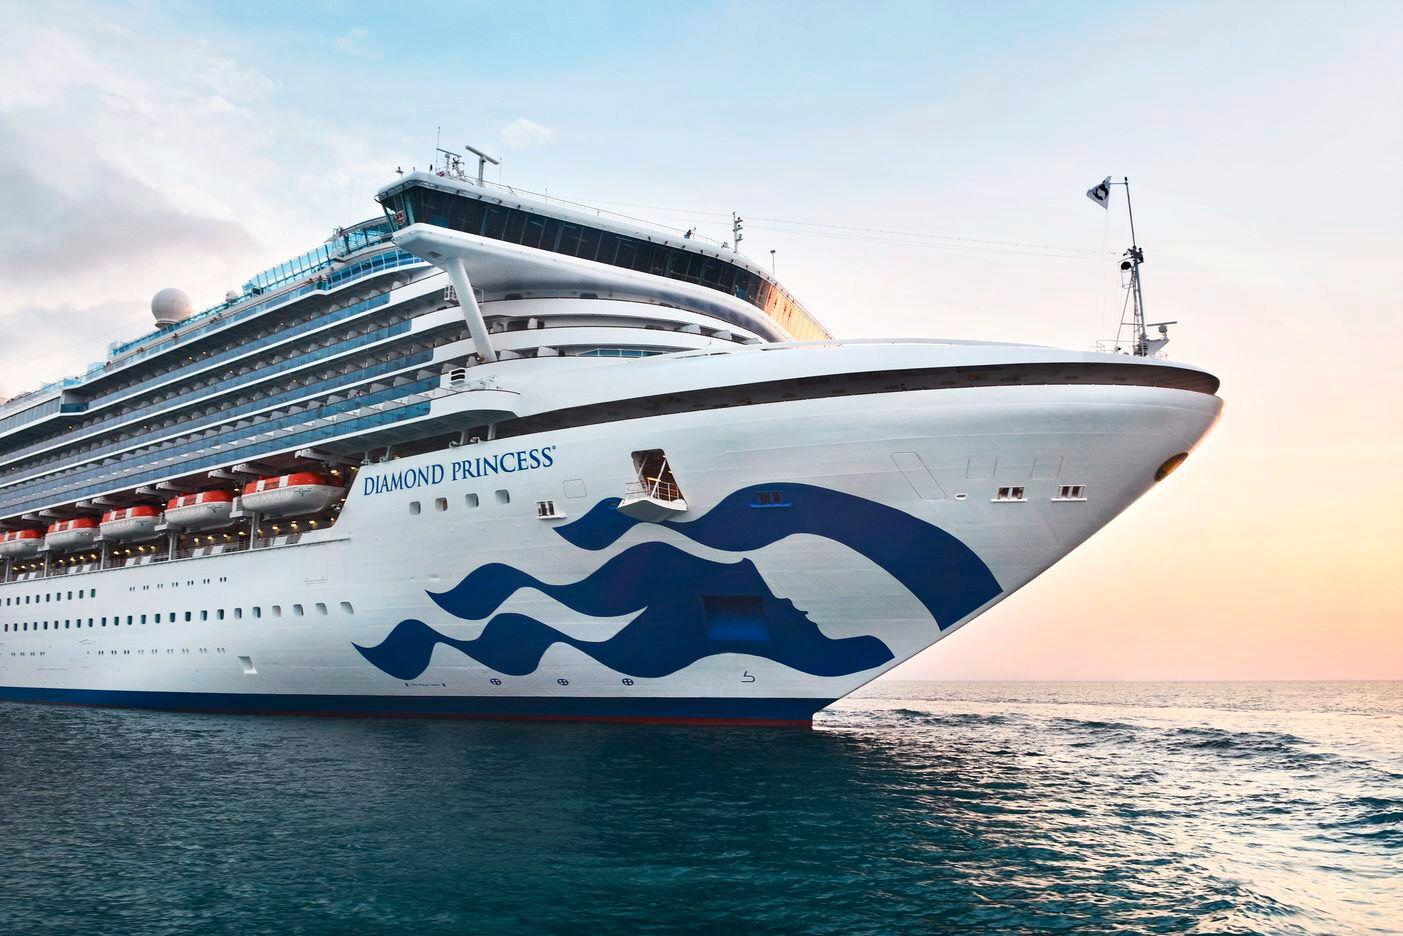 Diamond Princess - Kreuzfahrt Kap Horn und Antarktis plus Rundreise Peru